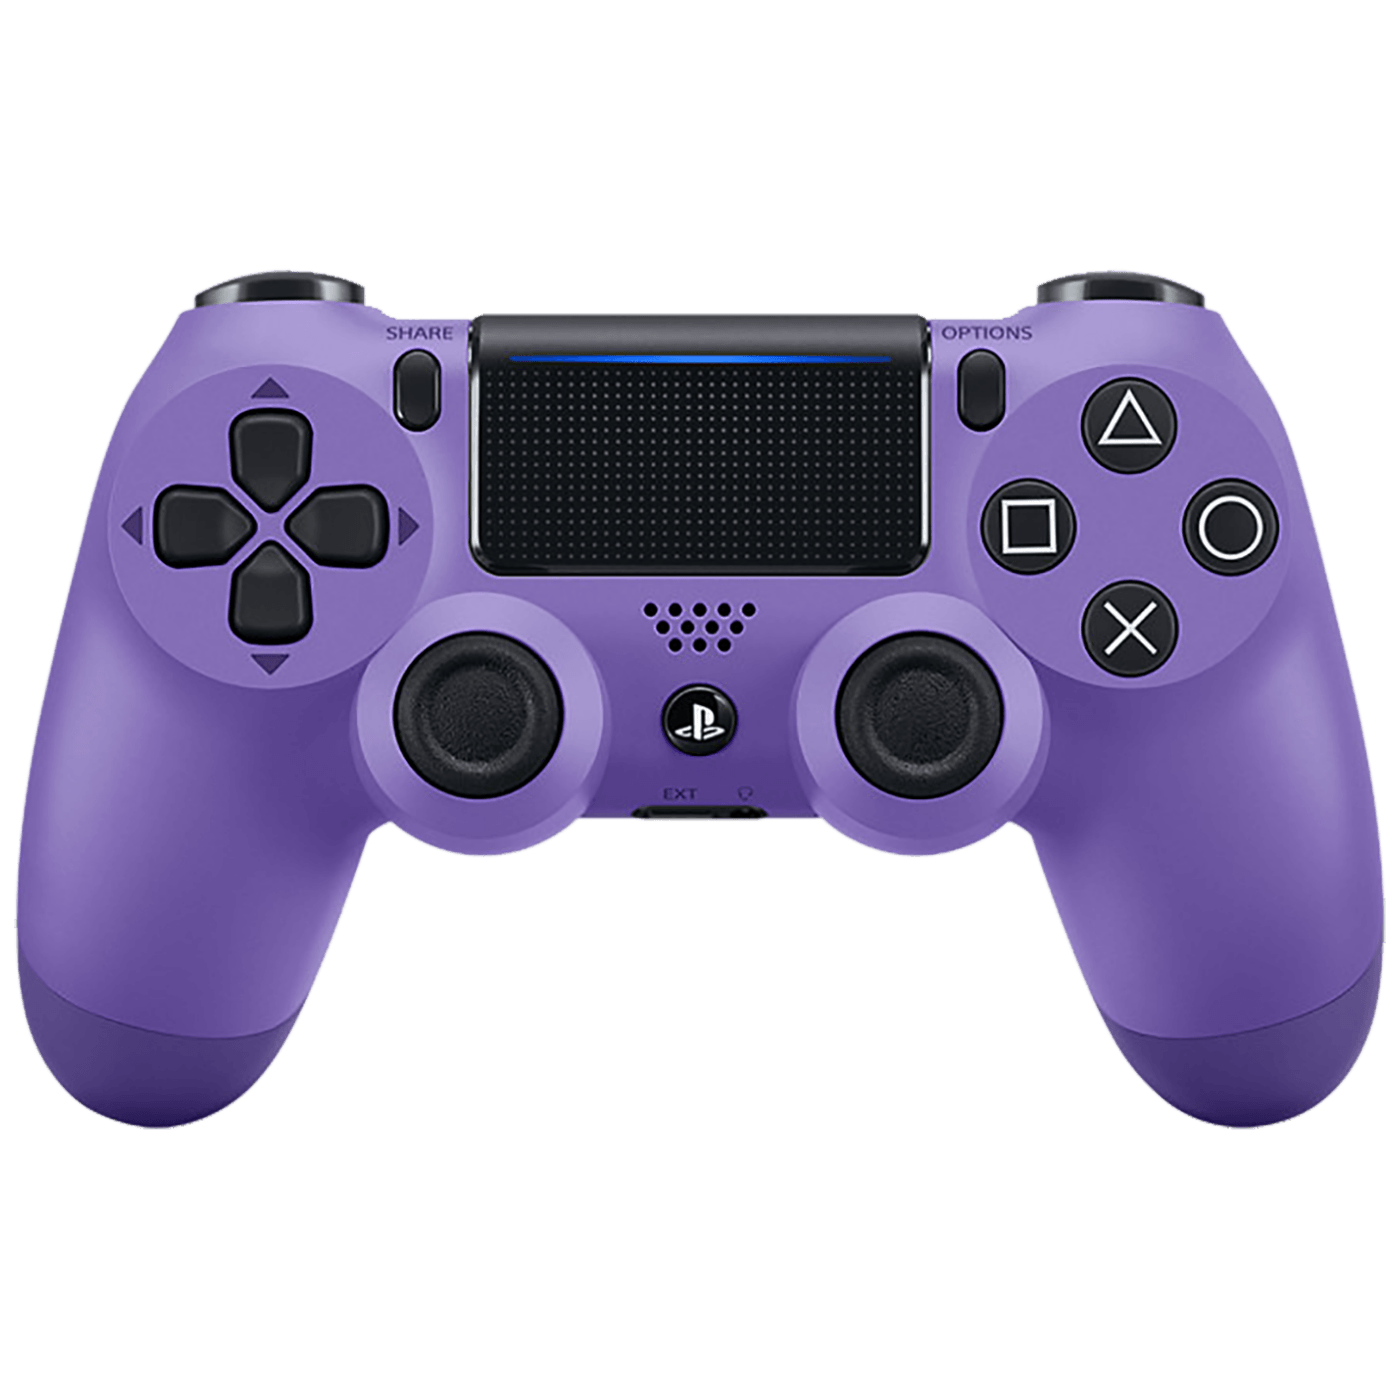 PS4 Dualshock Controller El. Purple